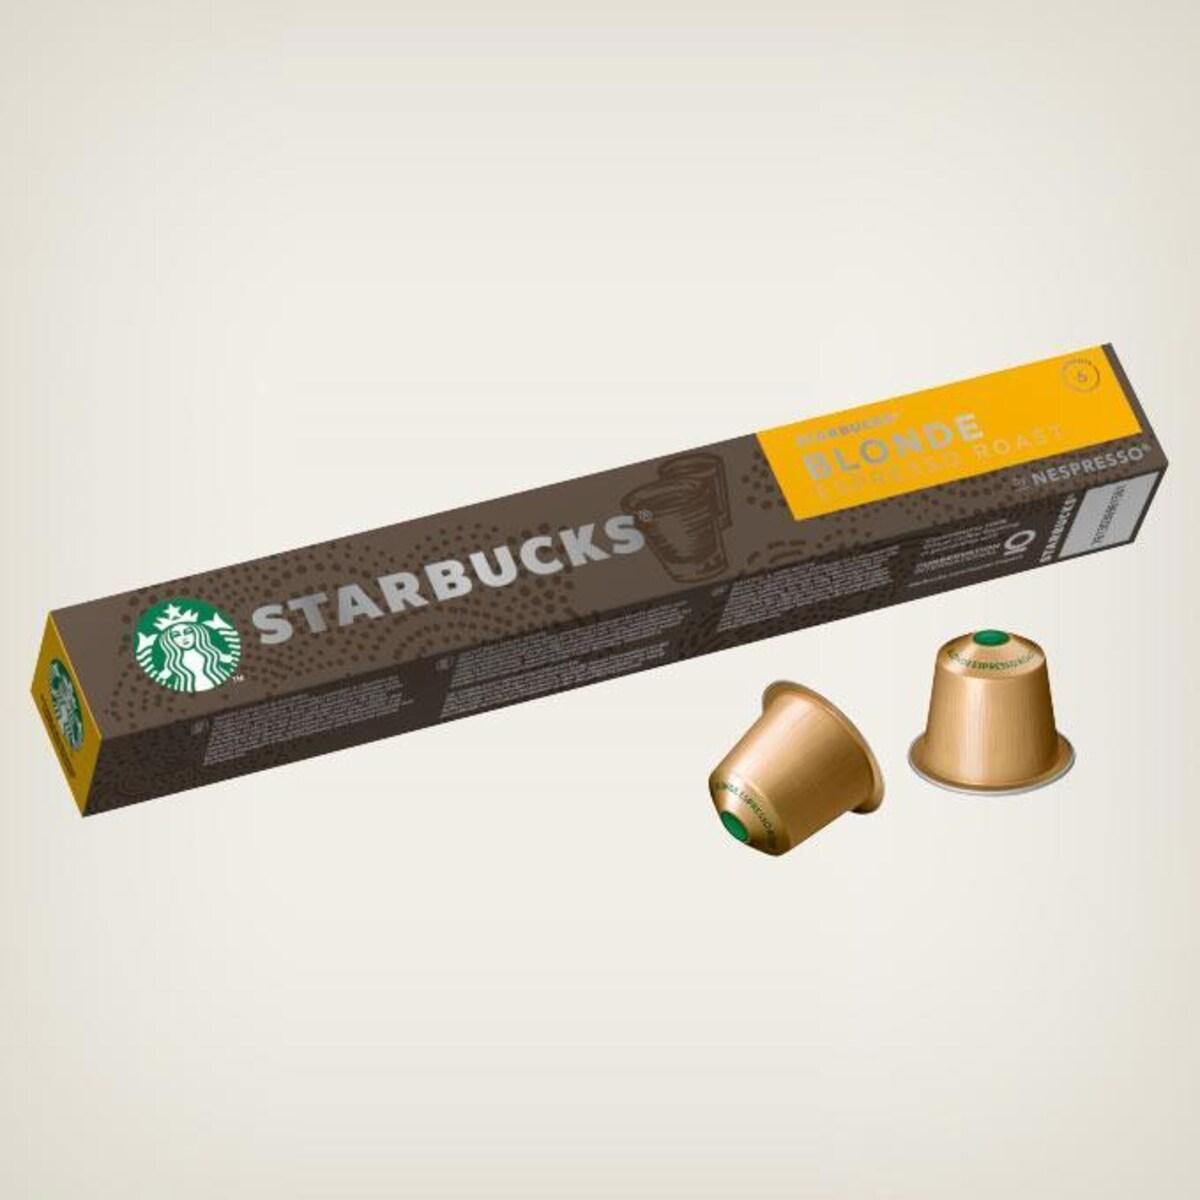 Starbucks Espresso Blonde 10бр Nespresso съвместими капсули